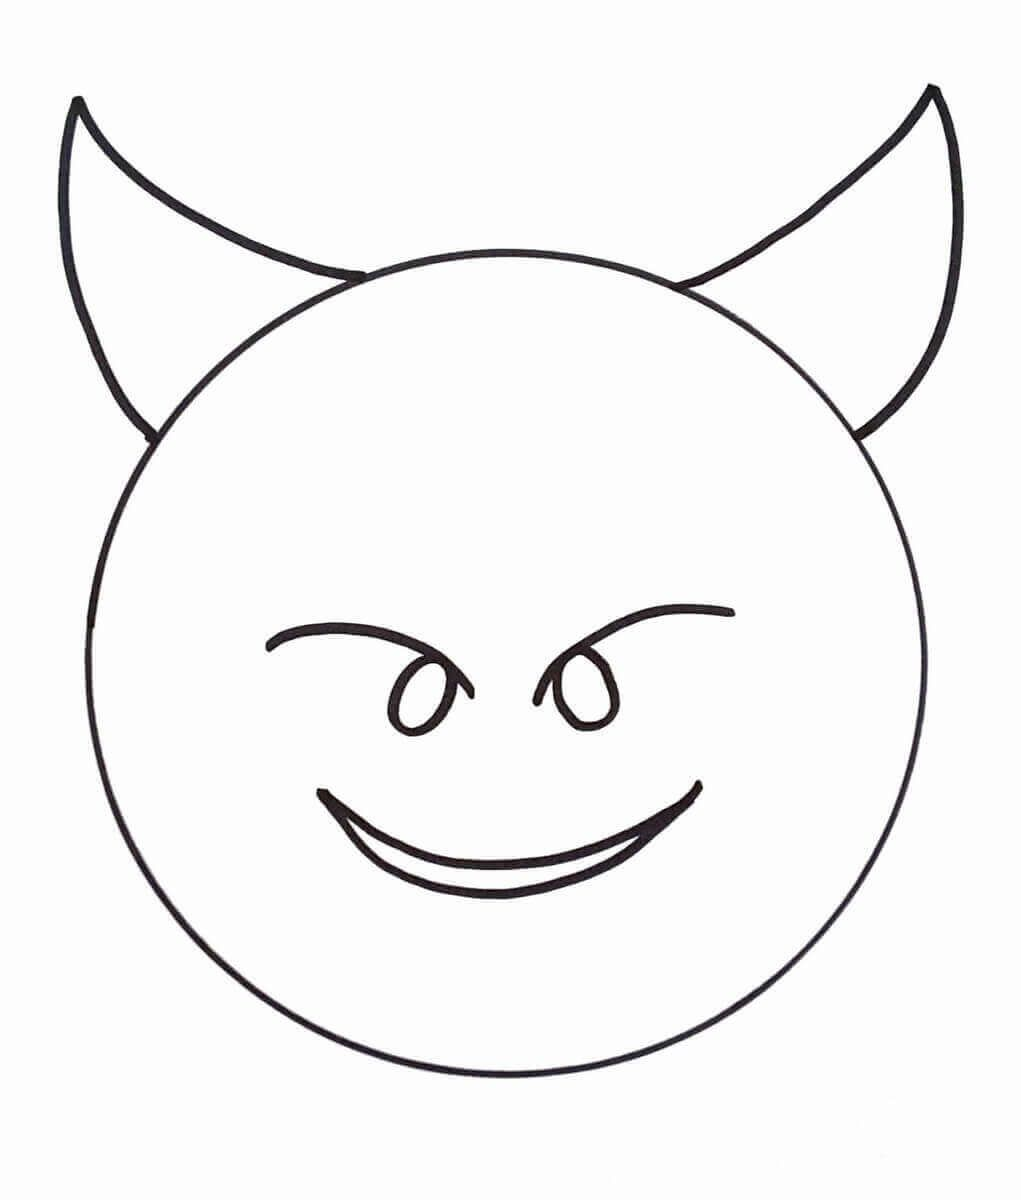 emoji malvorlagen xl | amorphi